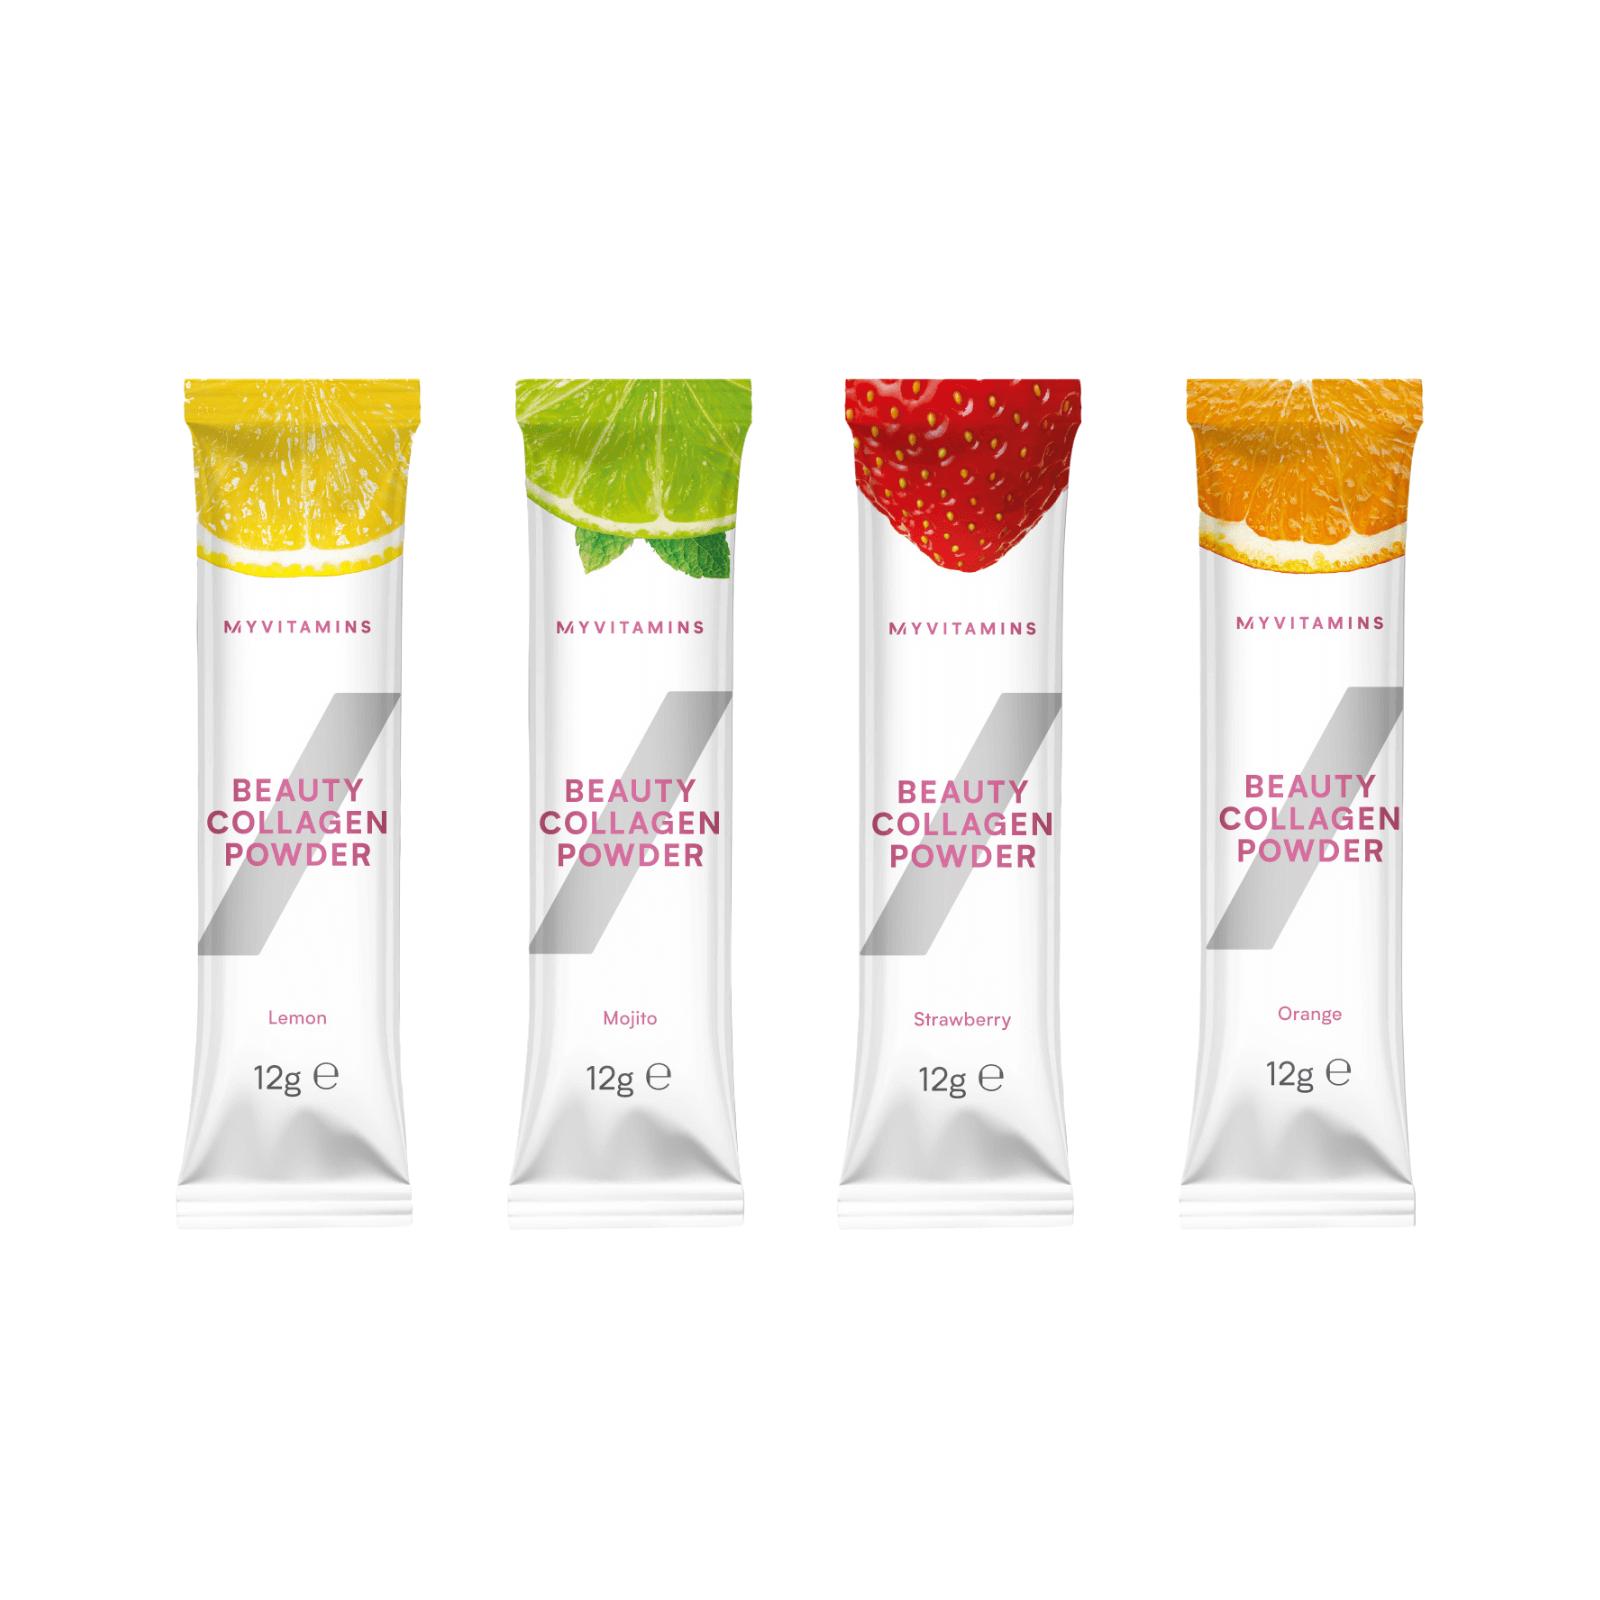 Beauty Collagen Powder Stick Pack (Sample) - 12g - Orange